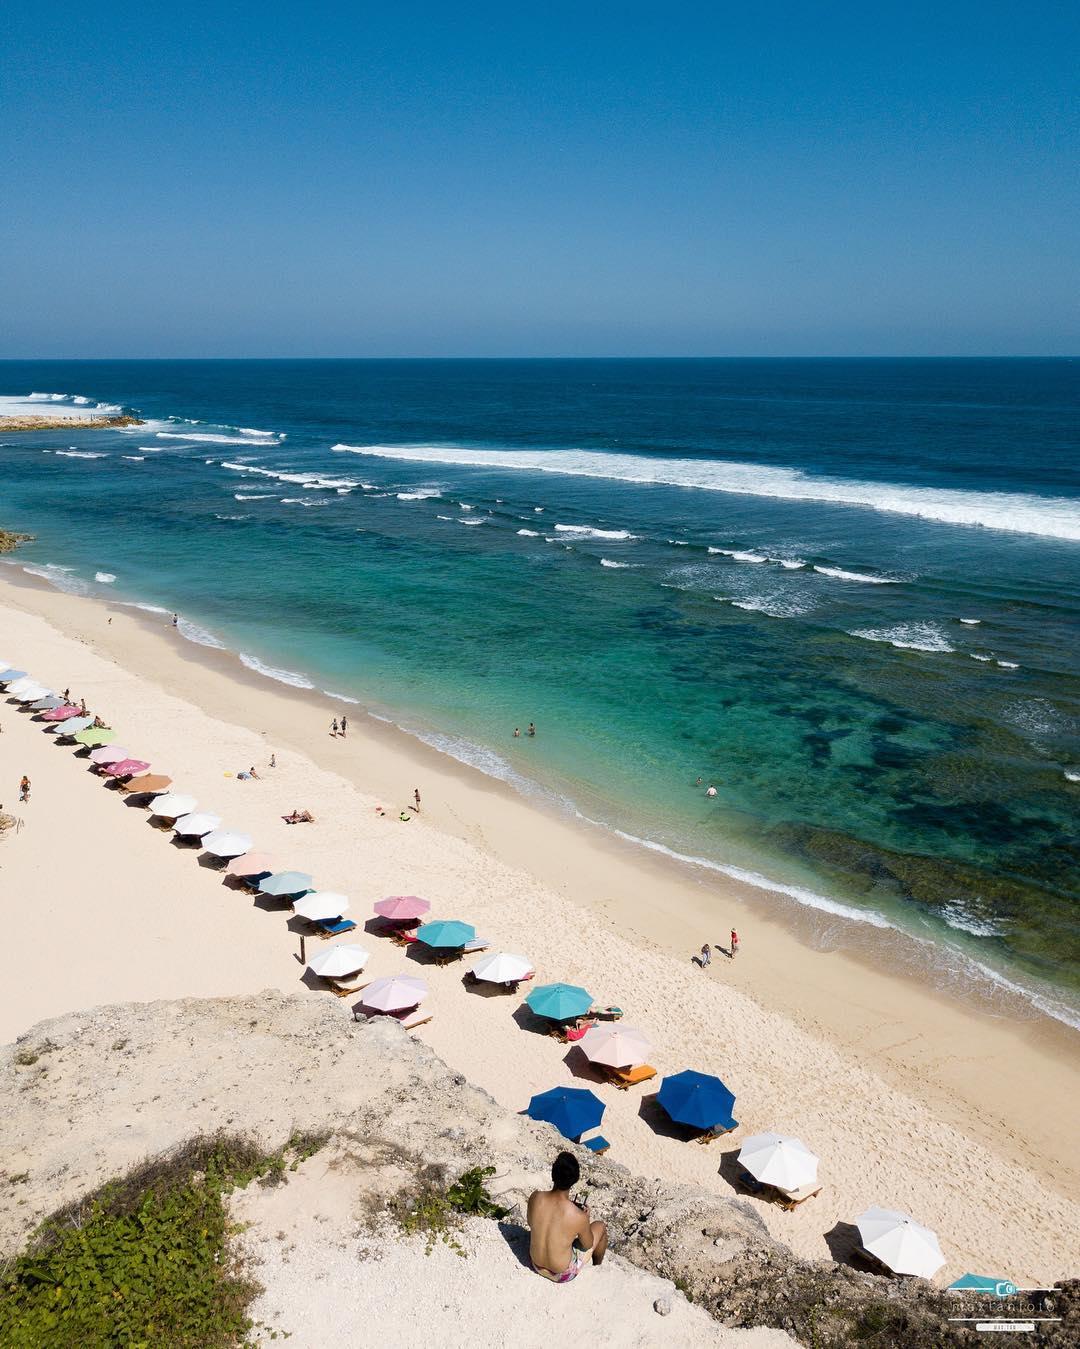 Hotel Near Melasti Bali Beach! via @maxtanwk